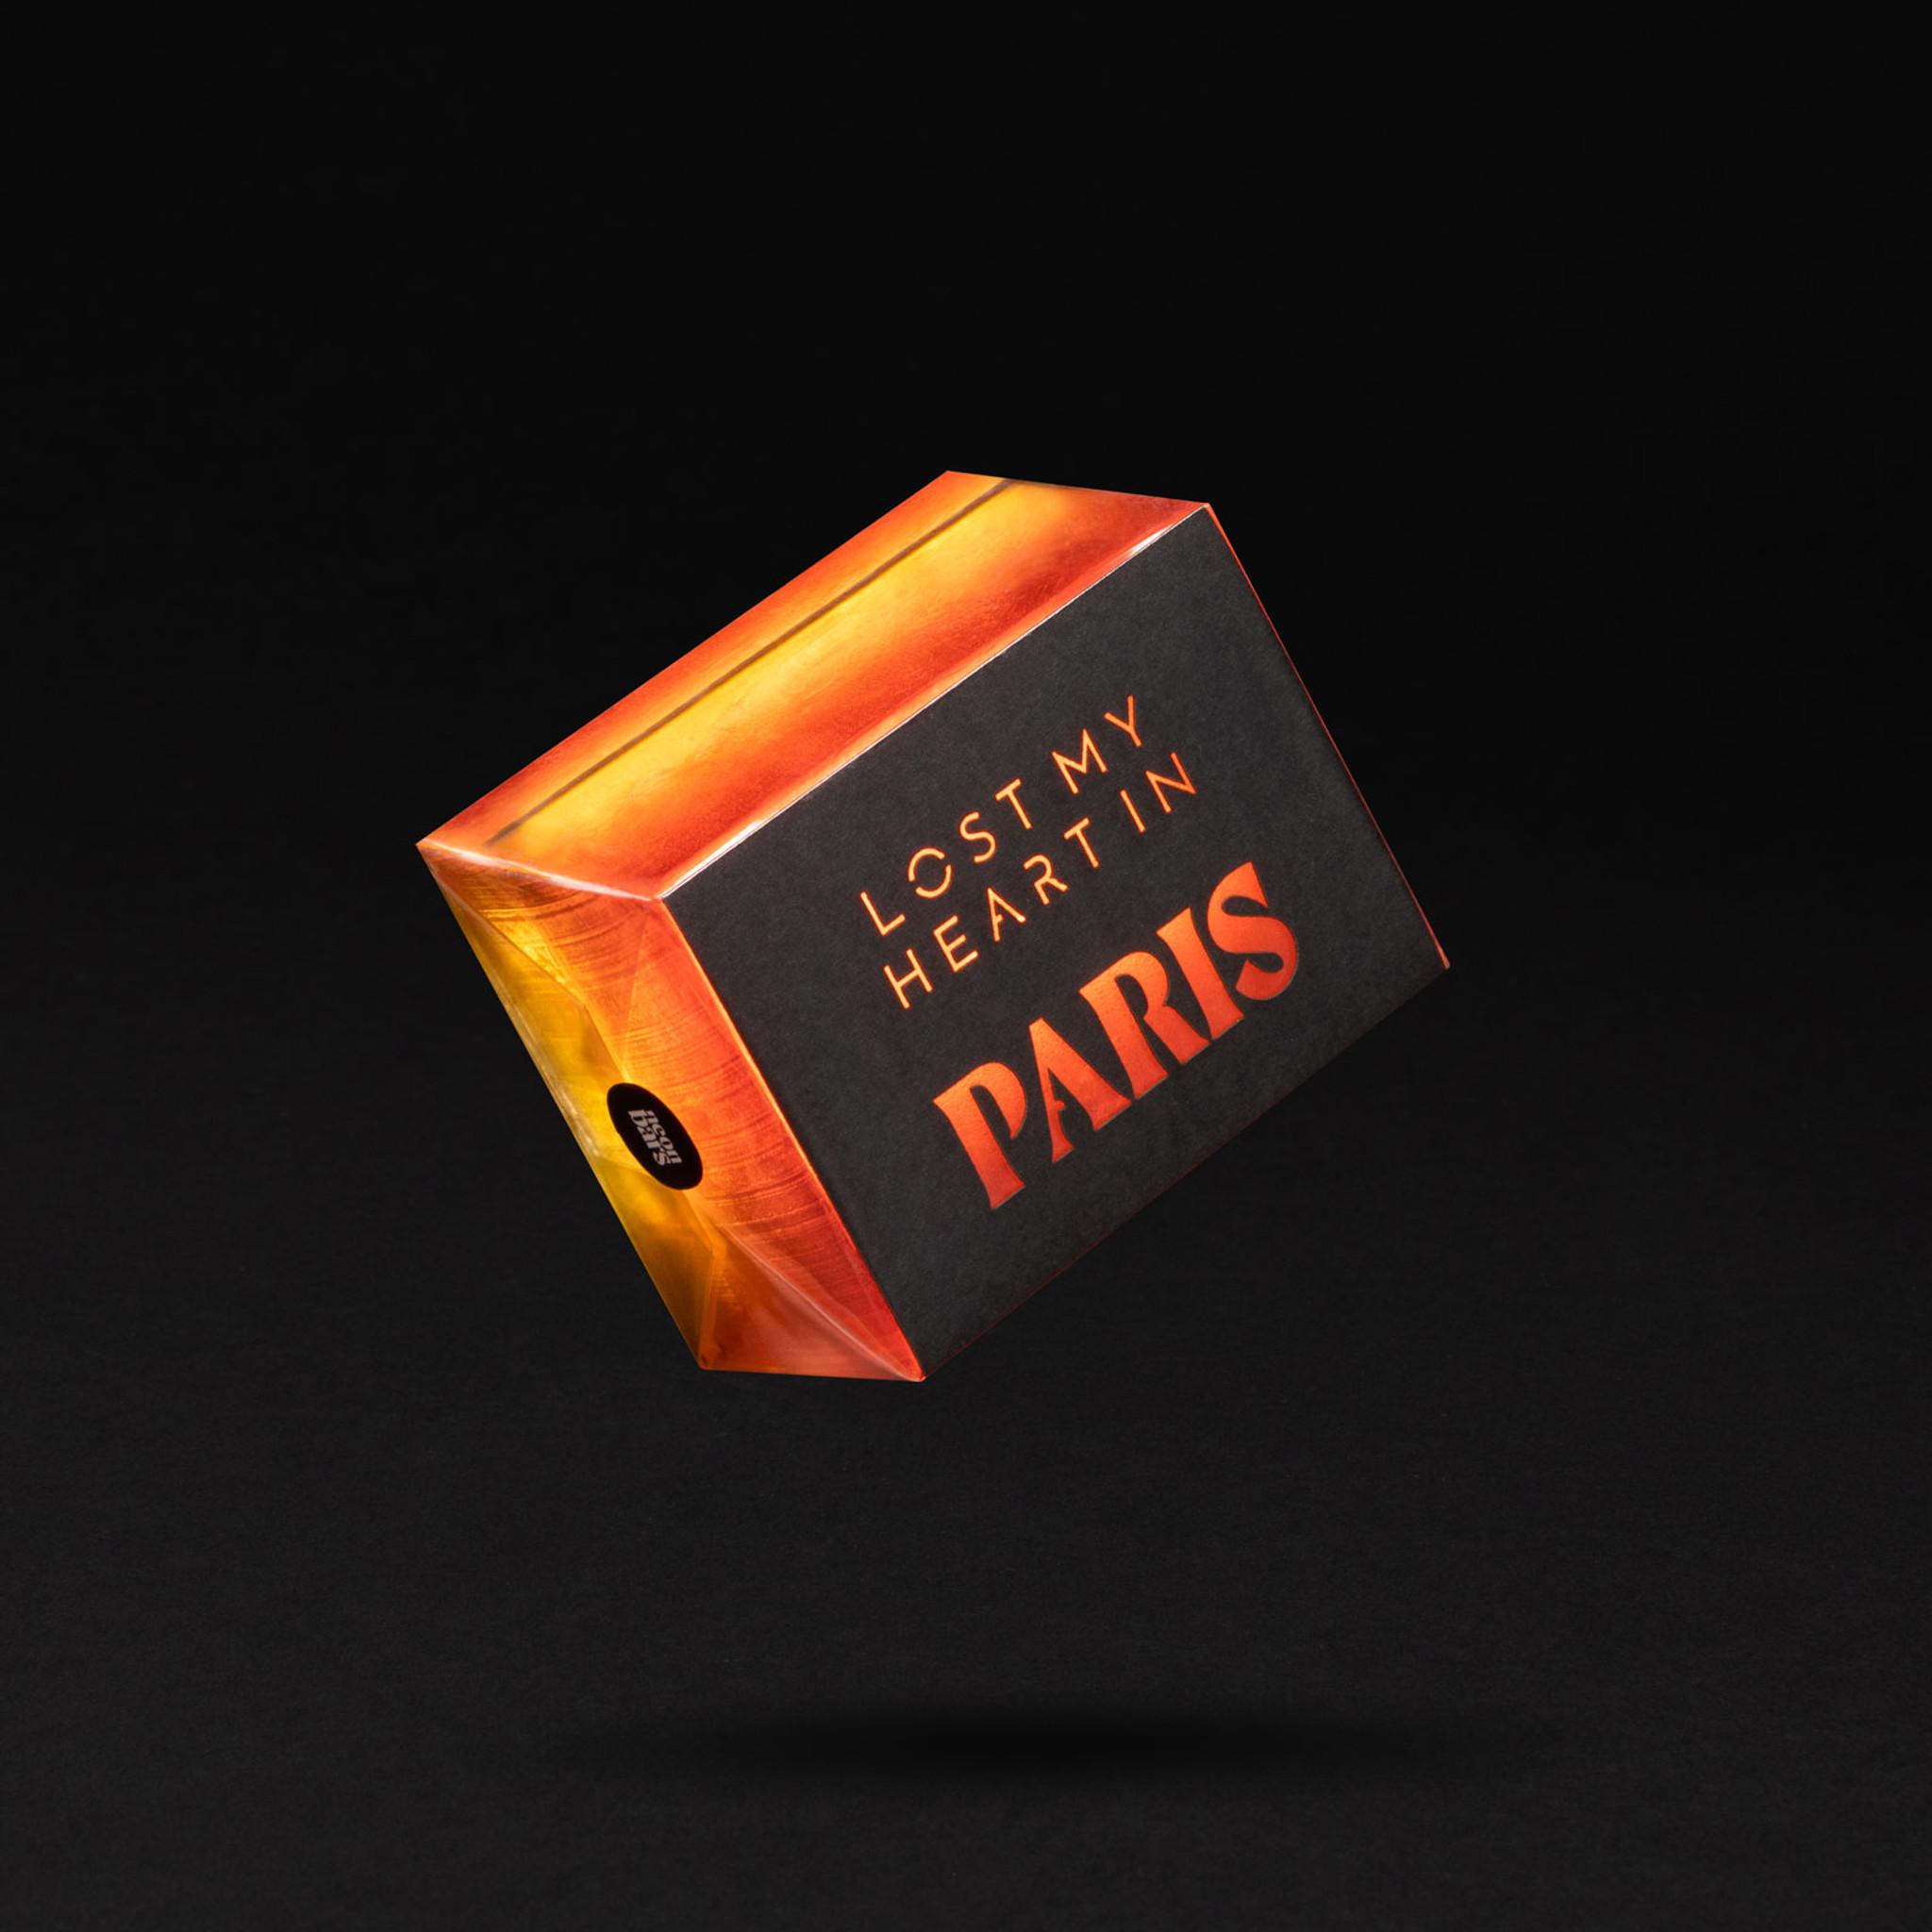 lost my heart in Paris